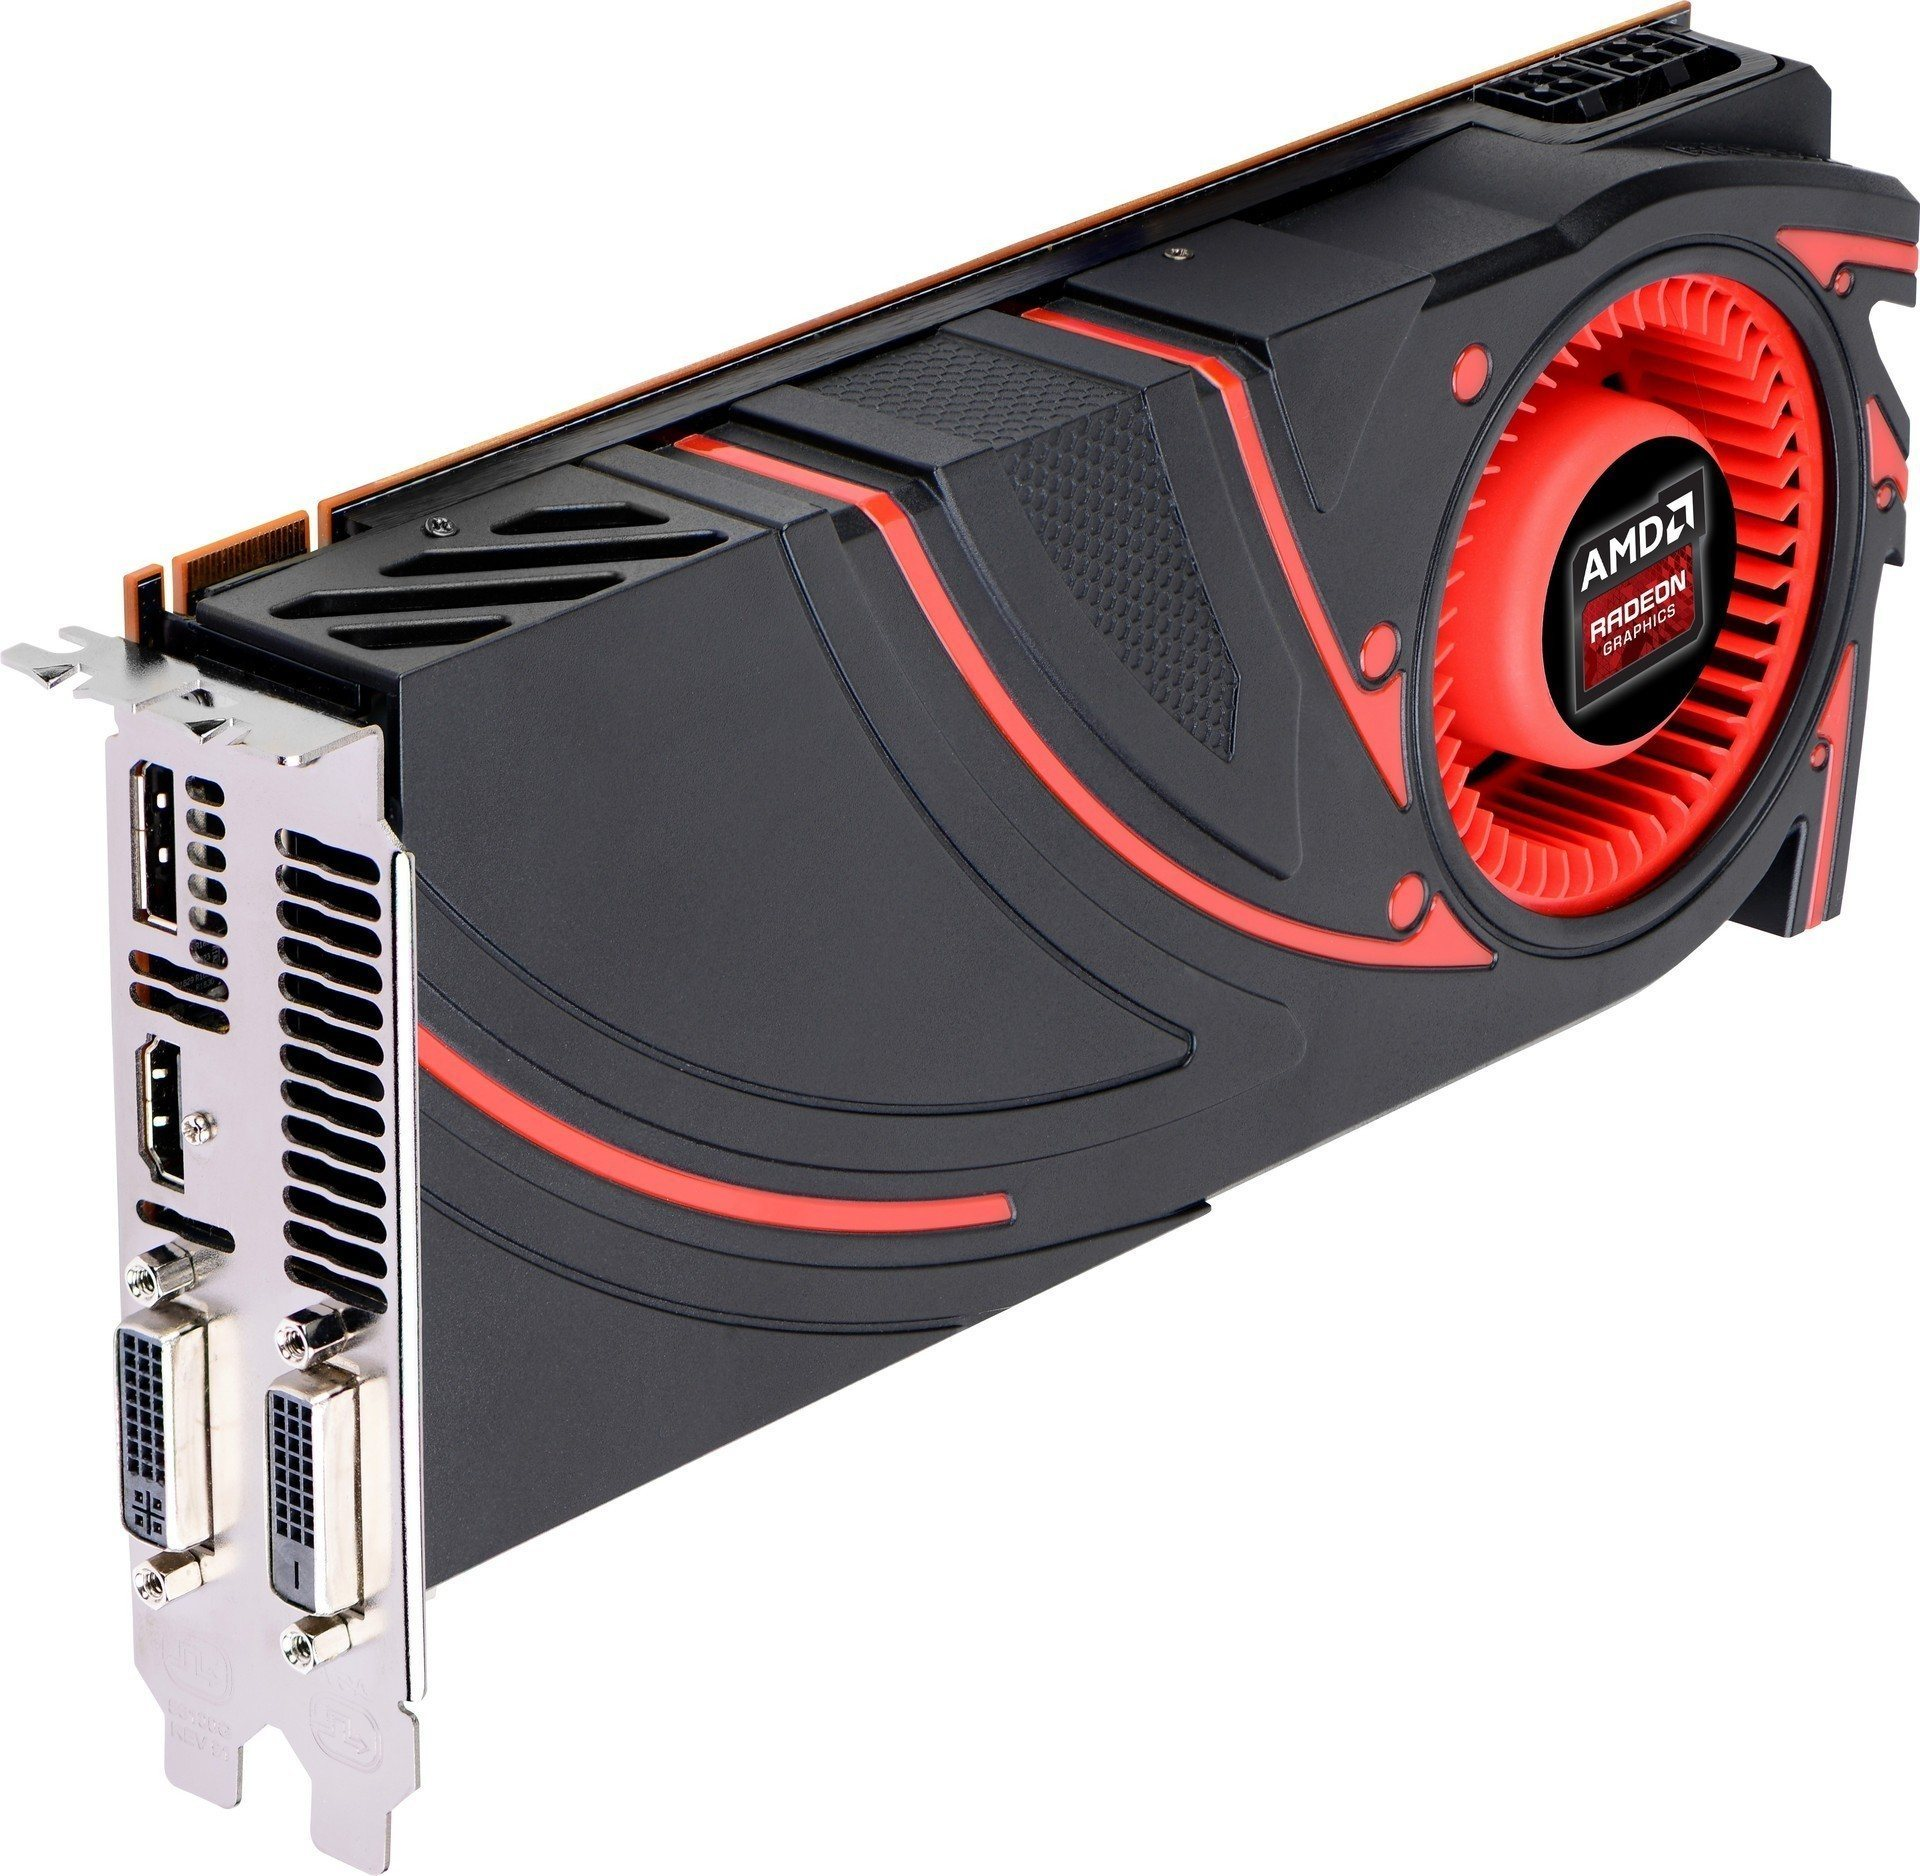 Configure PC w/ AMD Radeon R9 270X 2GB Video Card